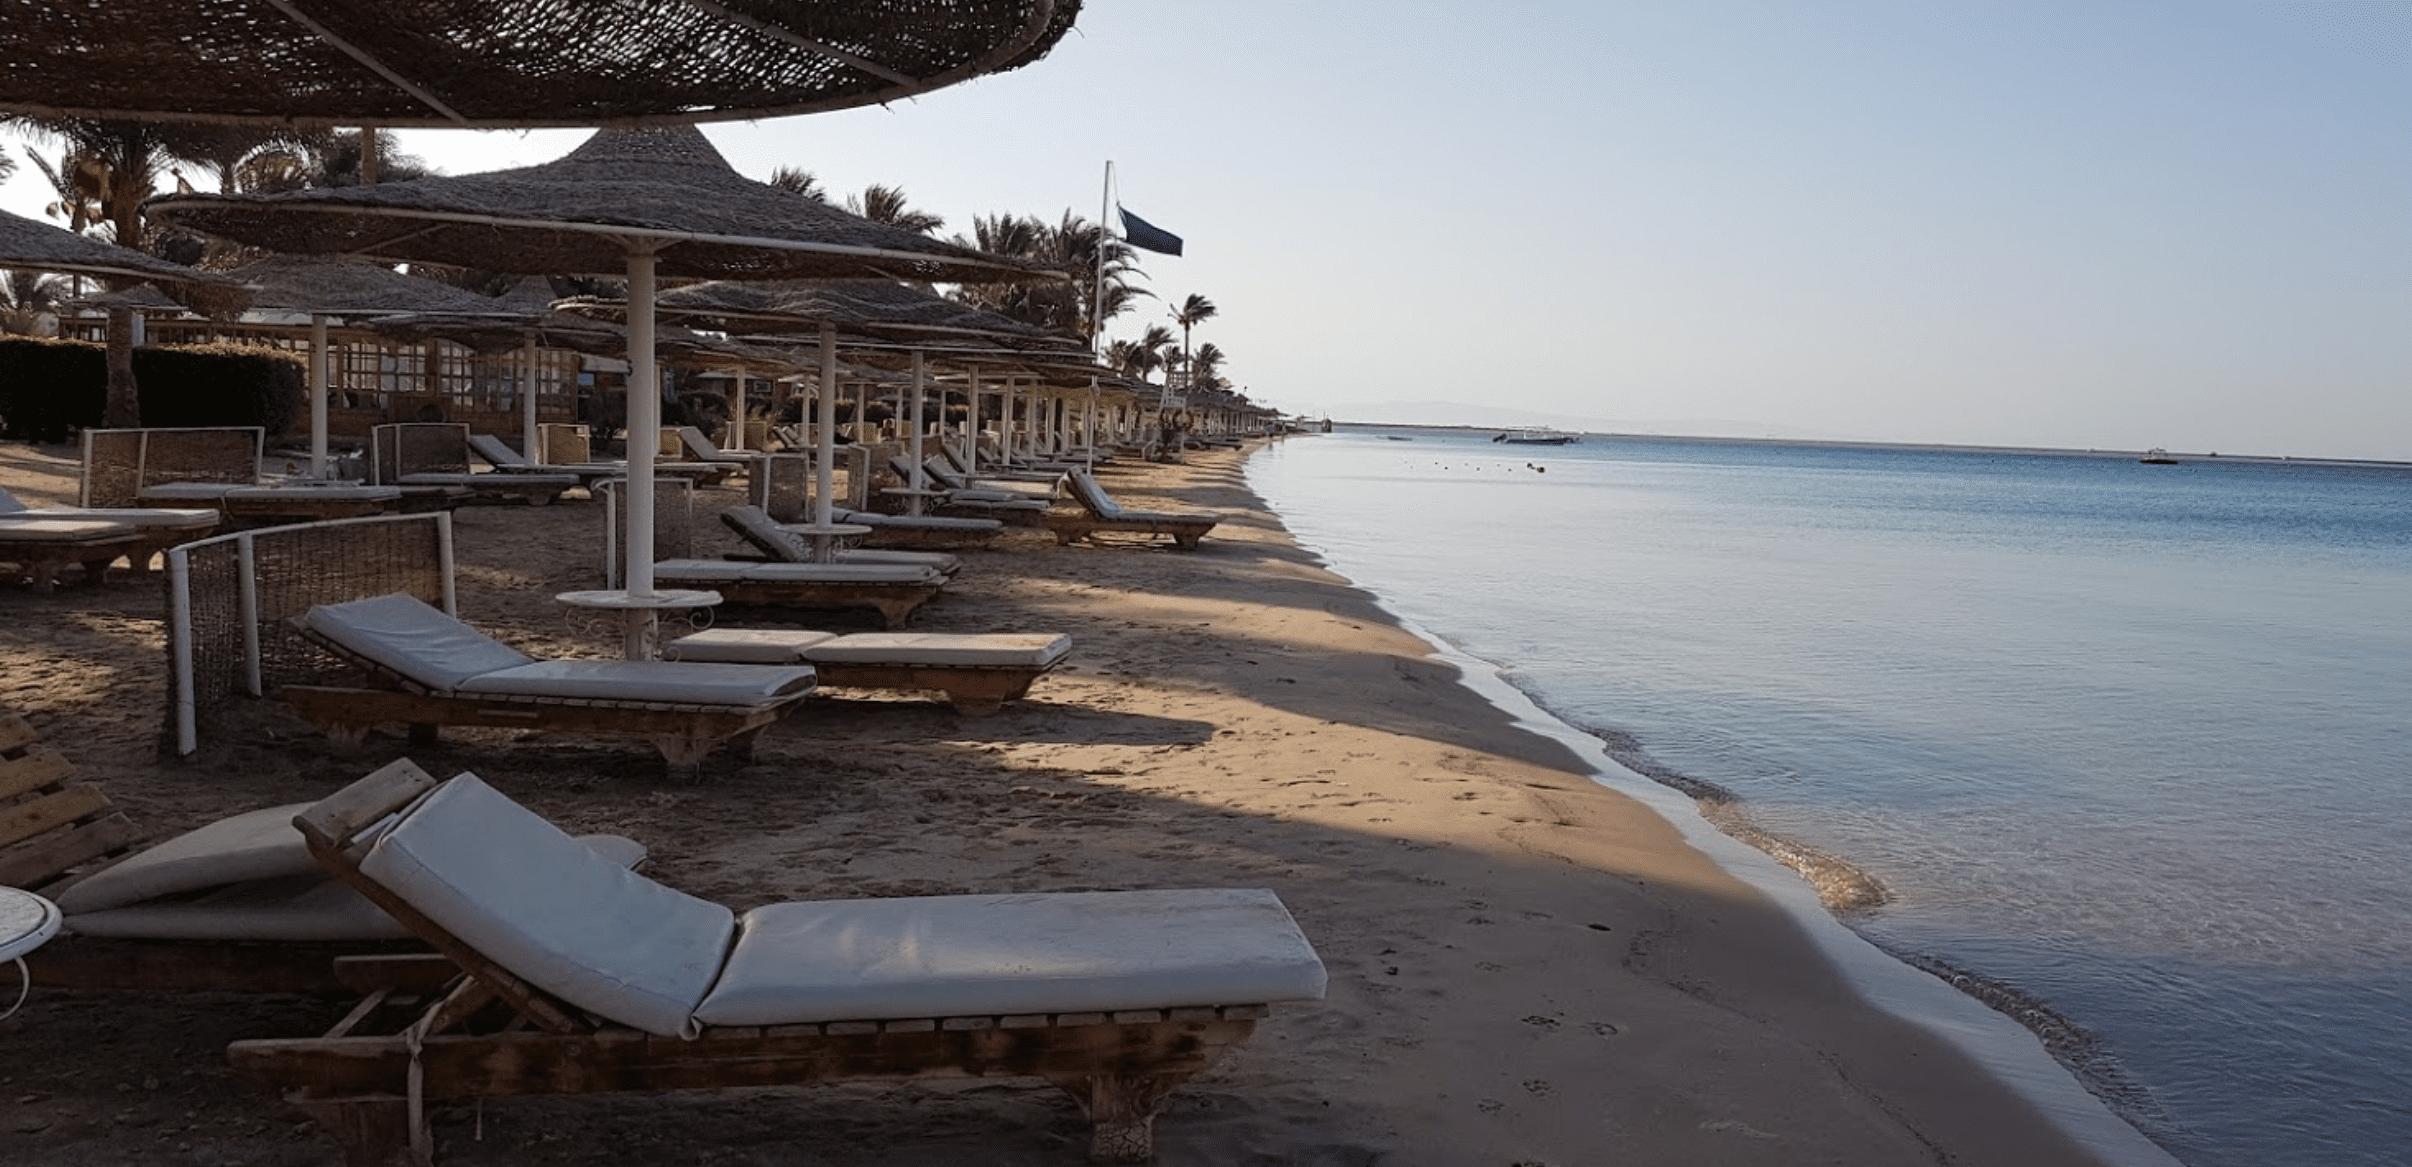 Dahab lagoon beach